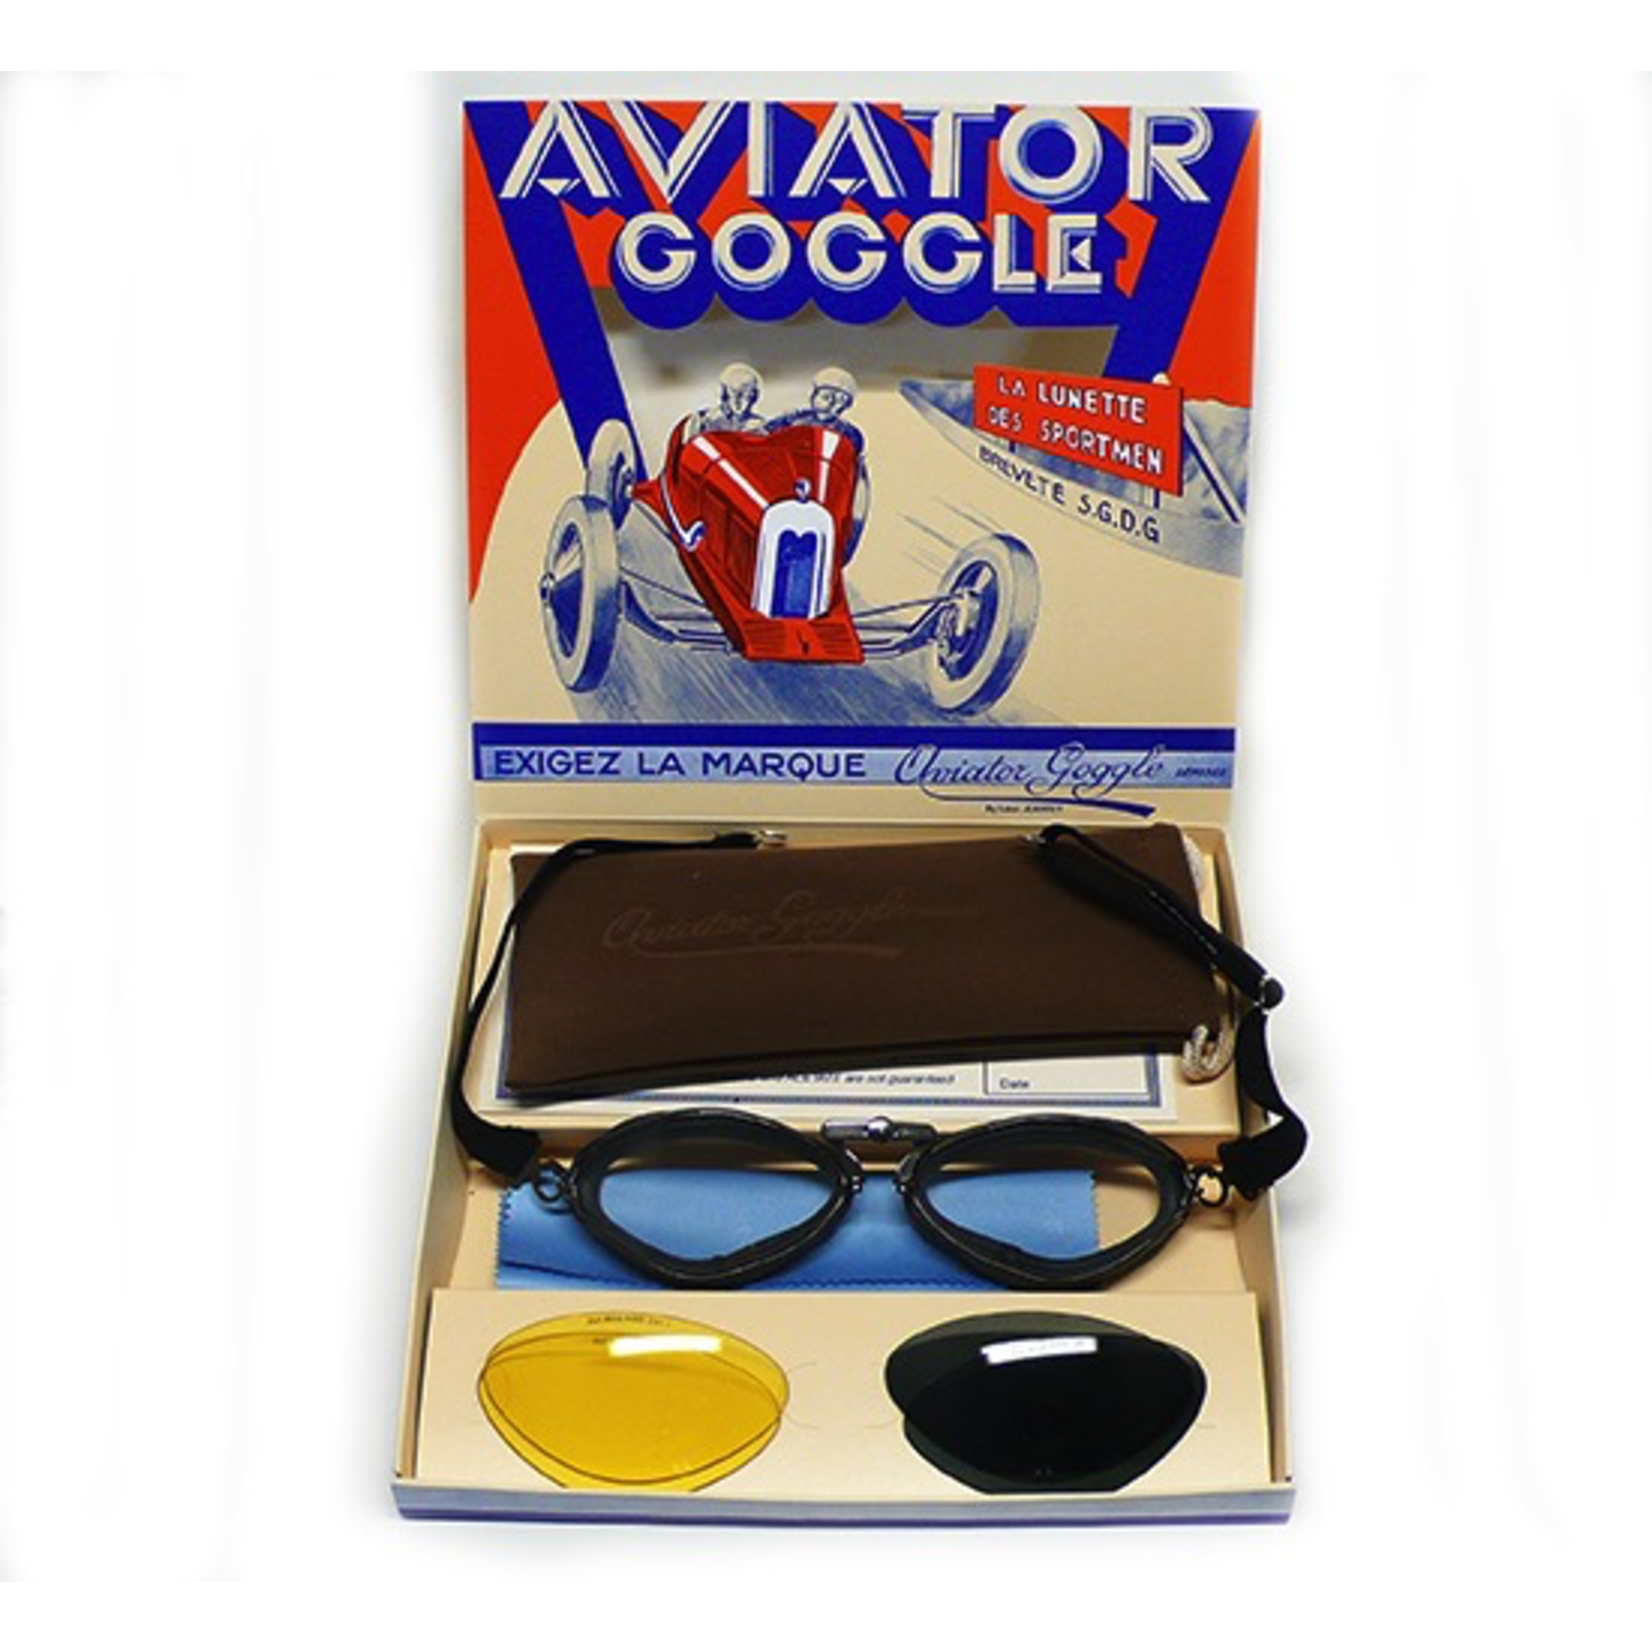 Apparel Goggles, Aviator Gun Metal Black Leather (France)